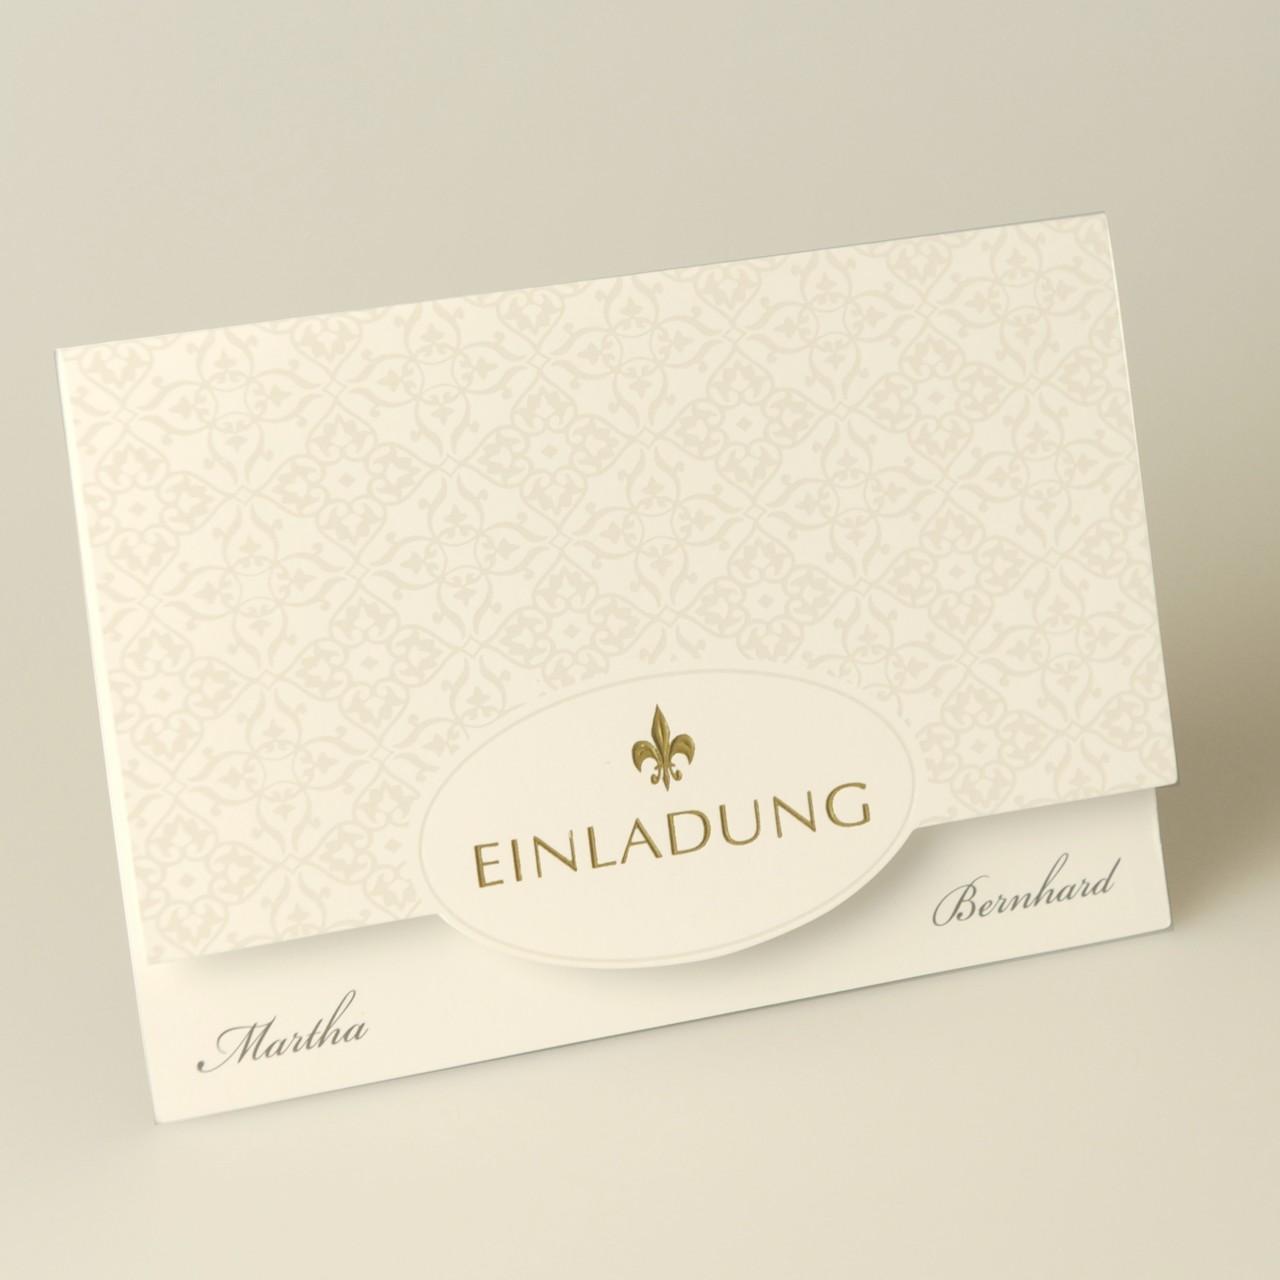 Einladungskarte - A 2016